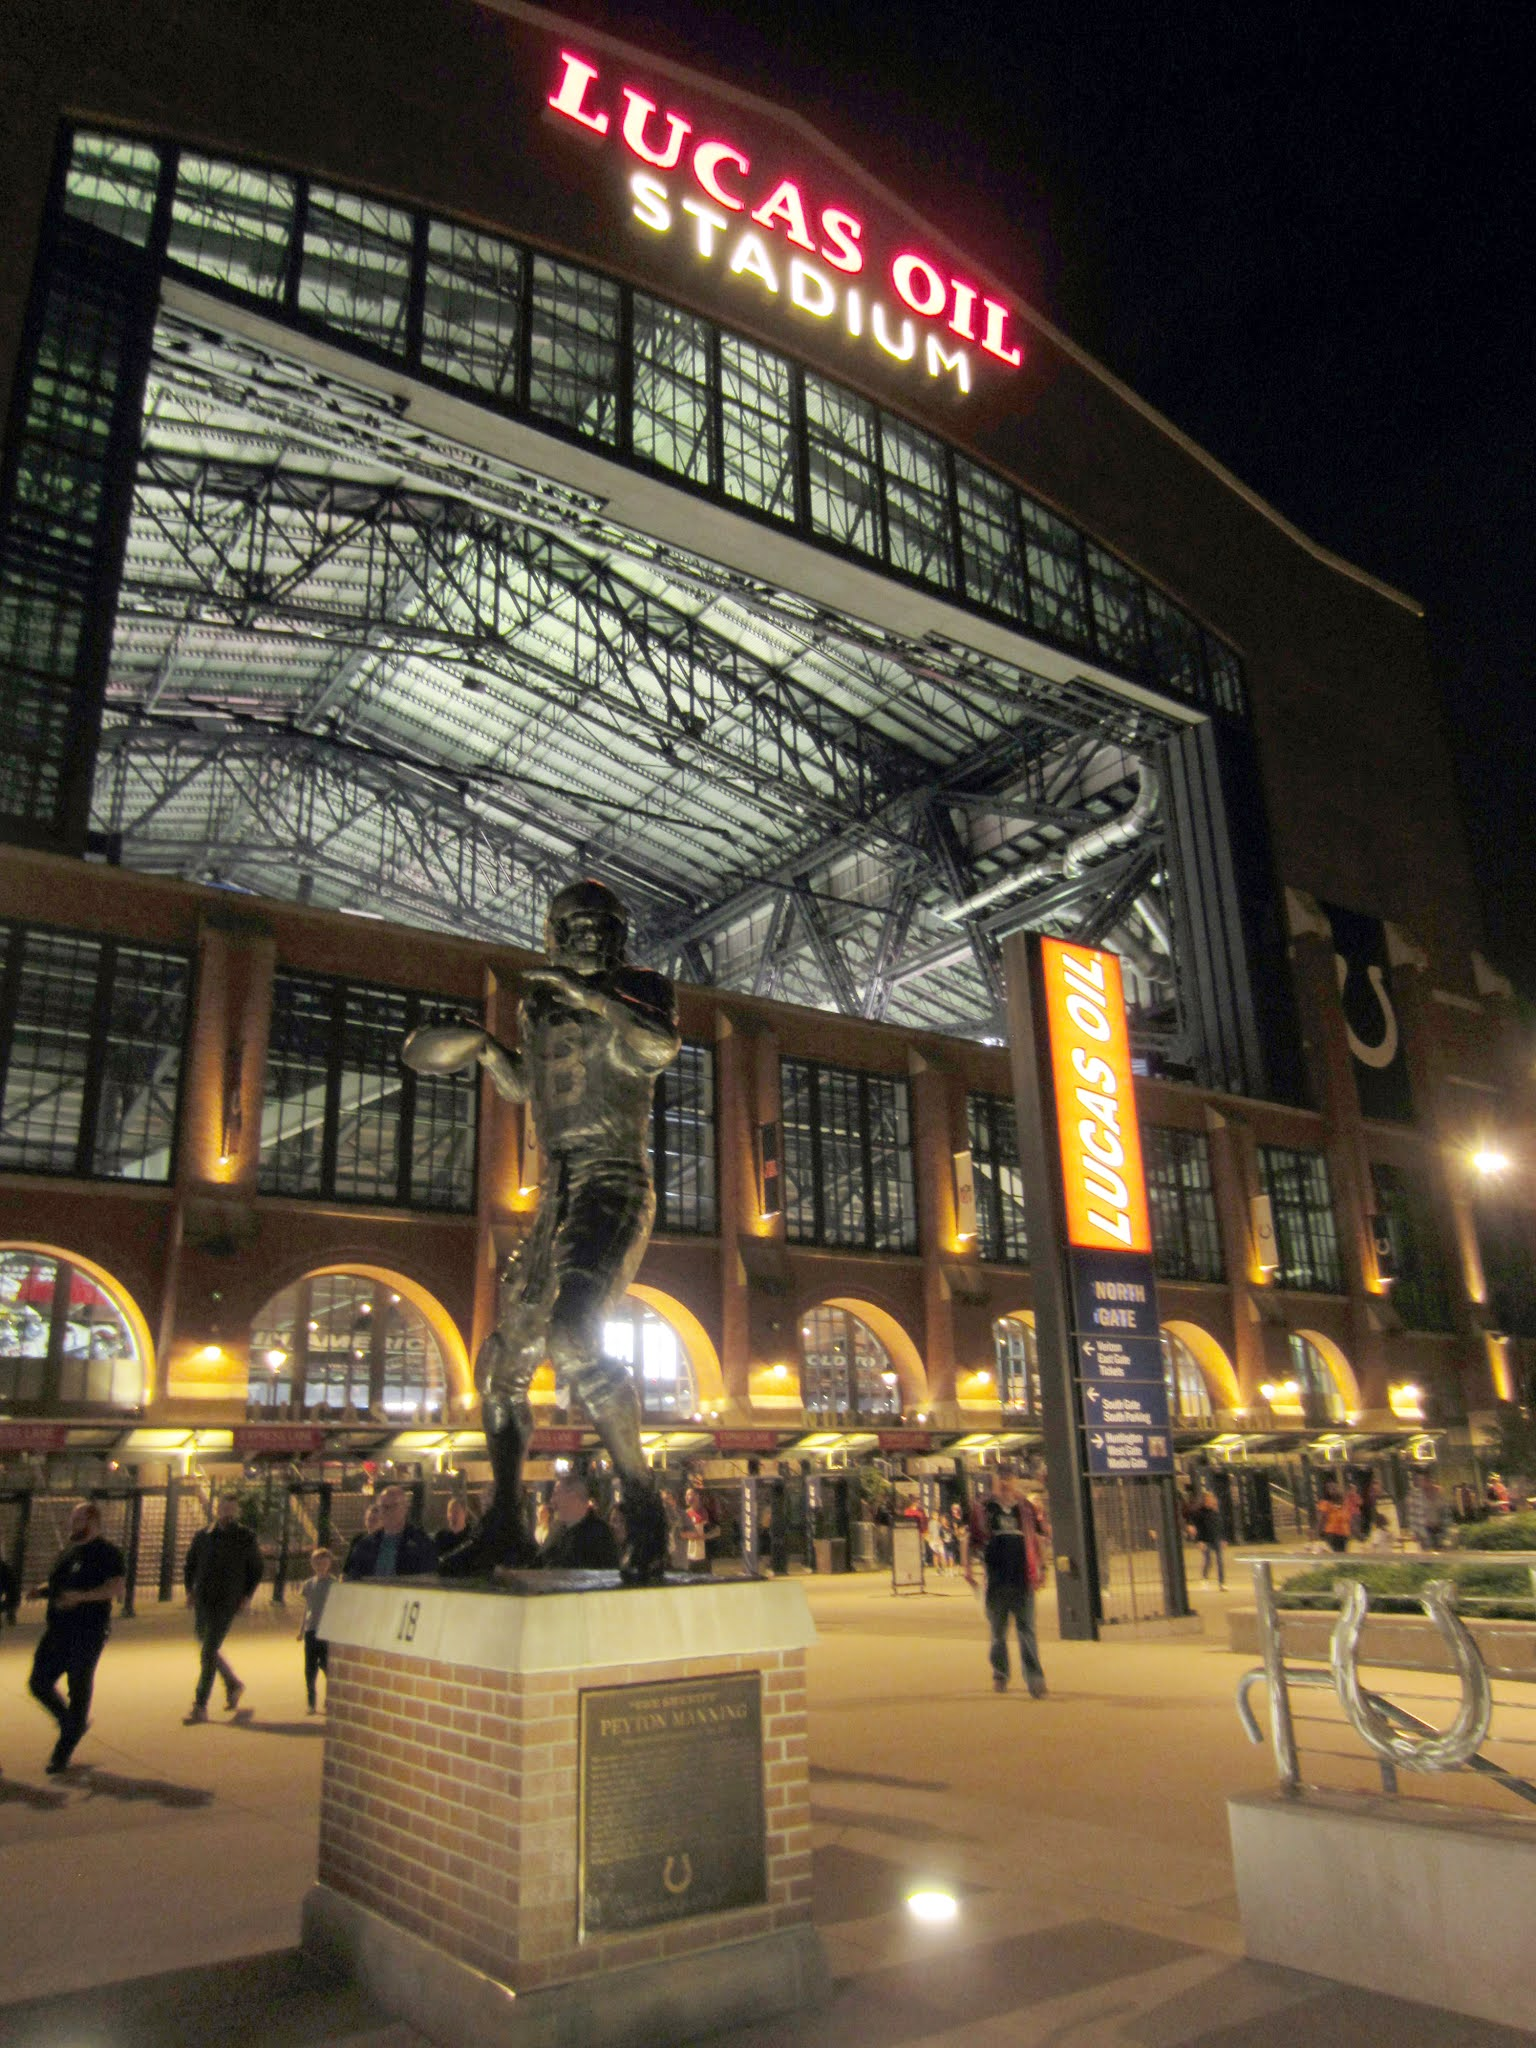 Lucas Oil Stadium exterior and Peyton Manning statue at night